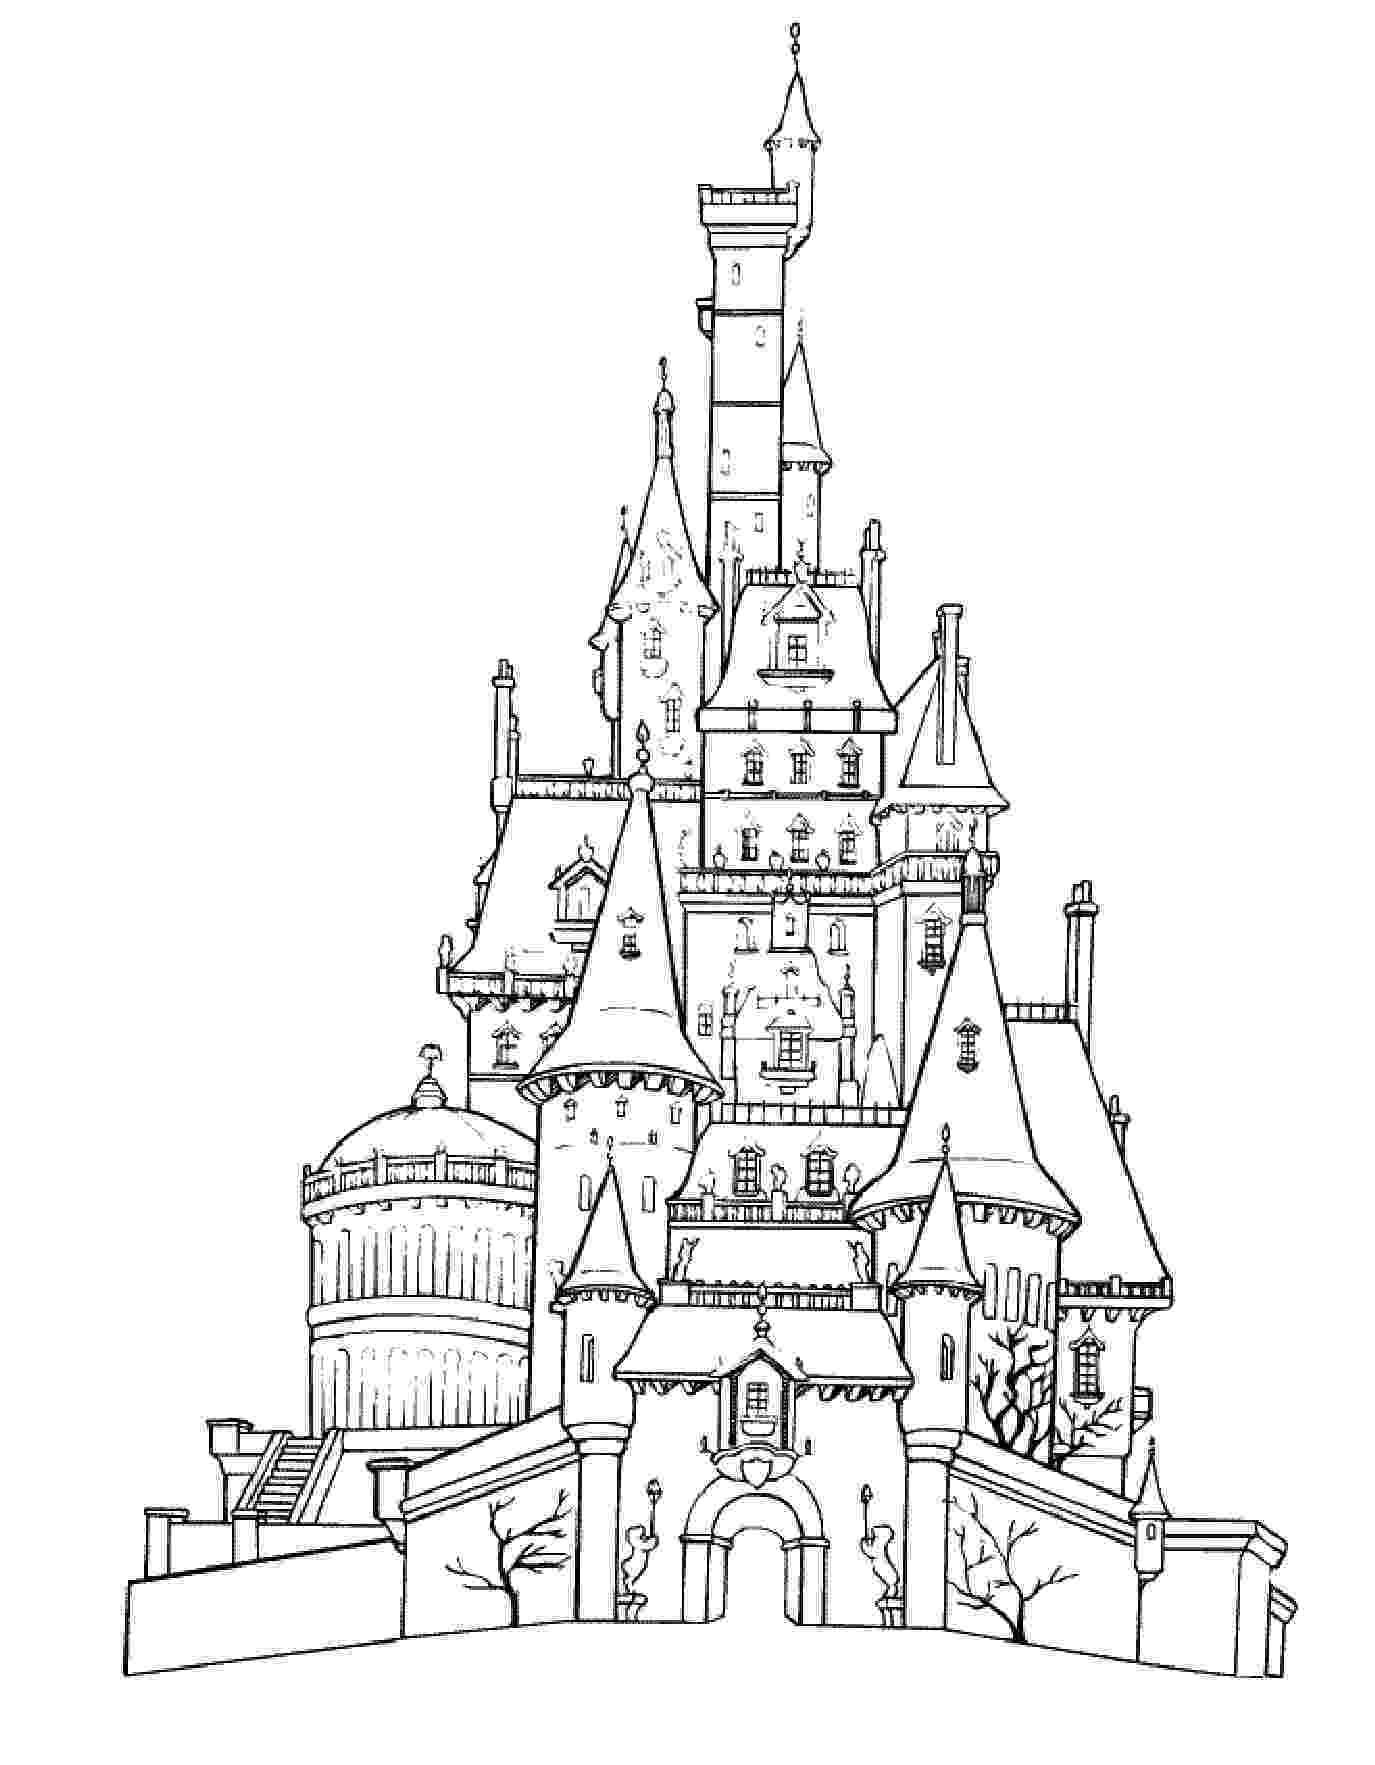 cinderella castle coloring pages castles coloring pages coloring pages cinderella castle